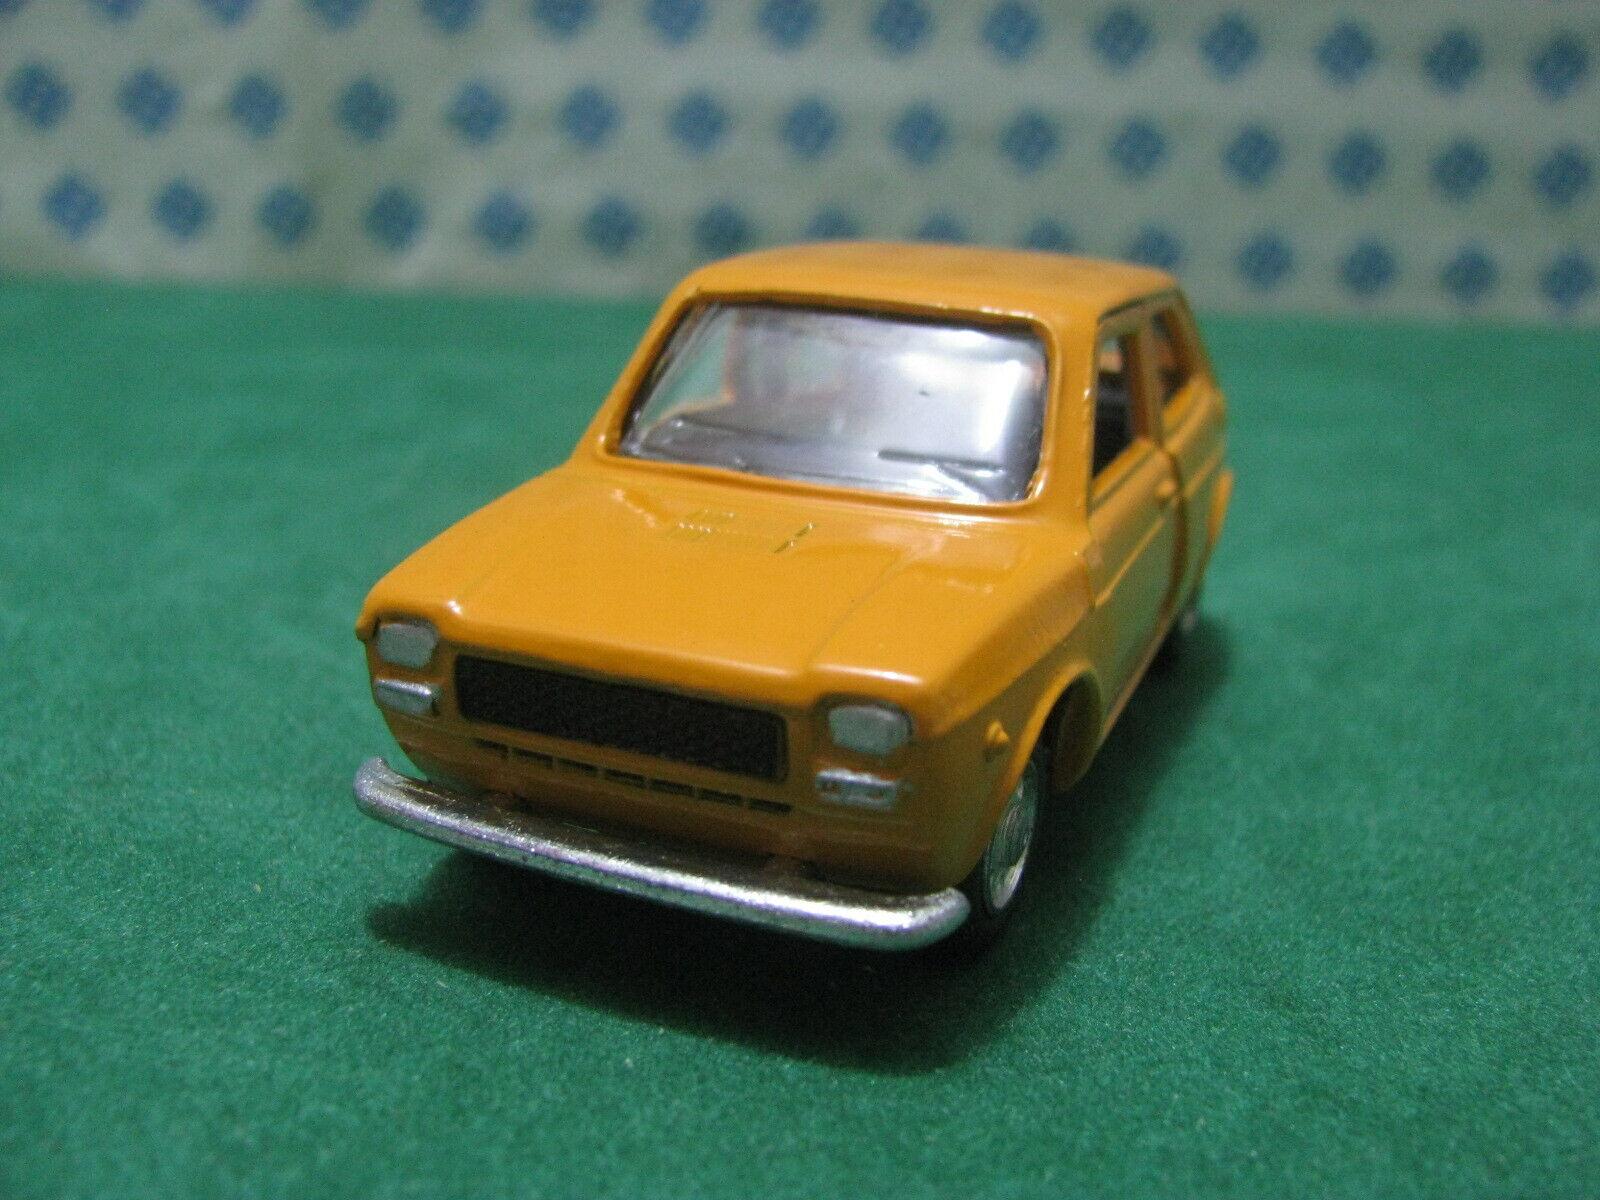 Vintage  -  FIAT 127  2 porte   - 1 43  Mercury  Art. 311